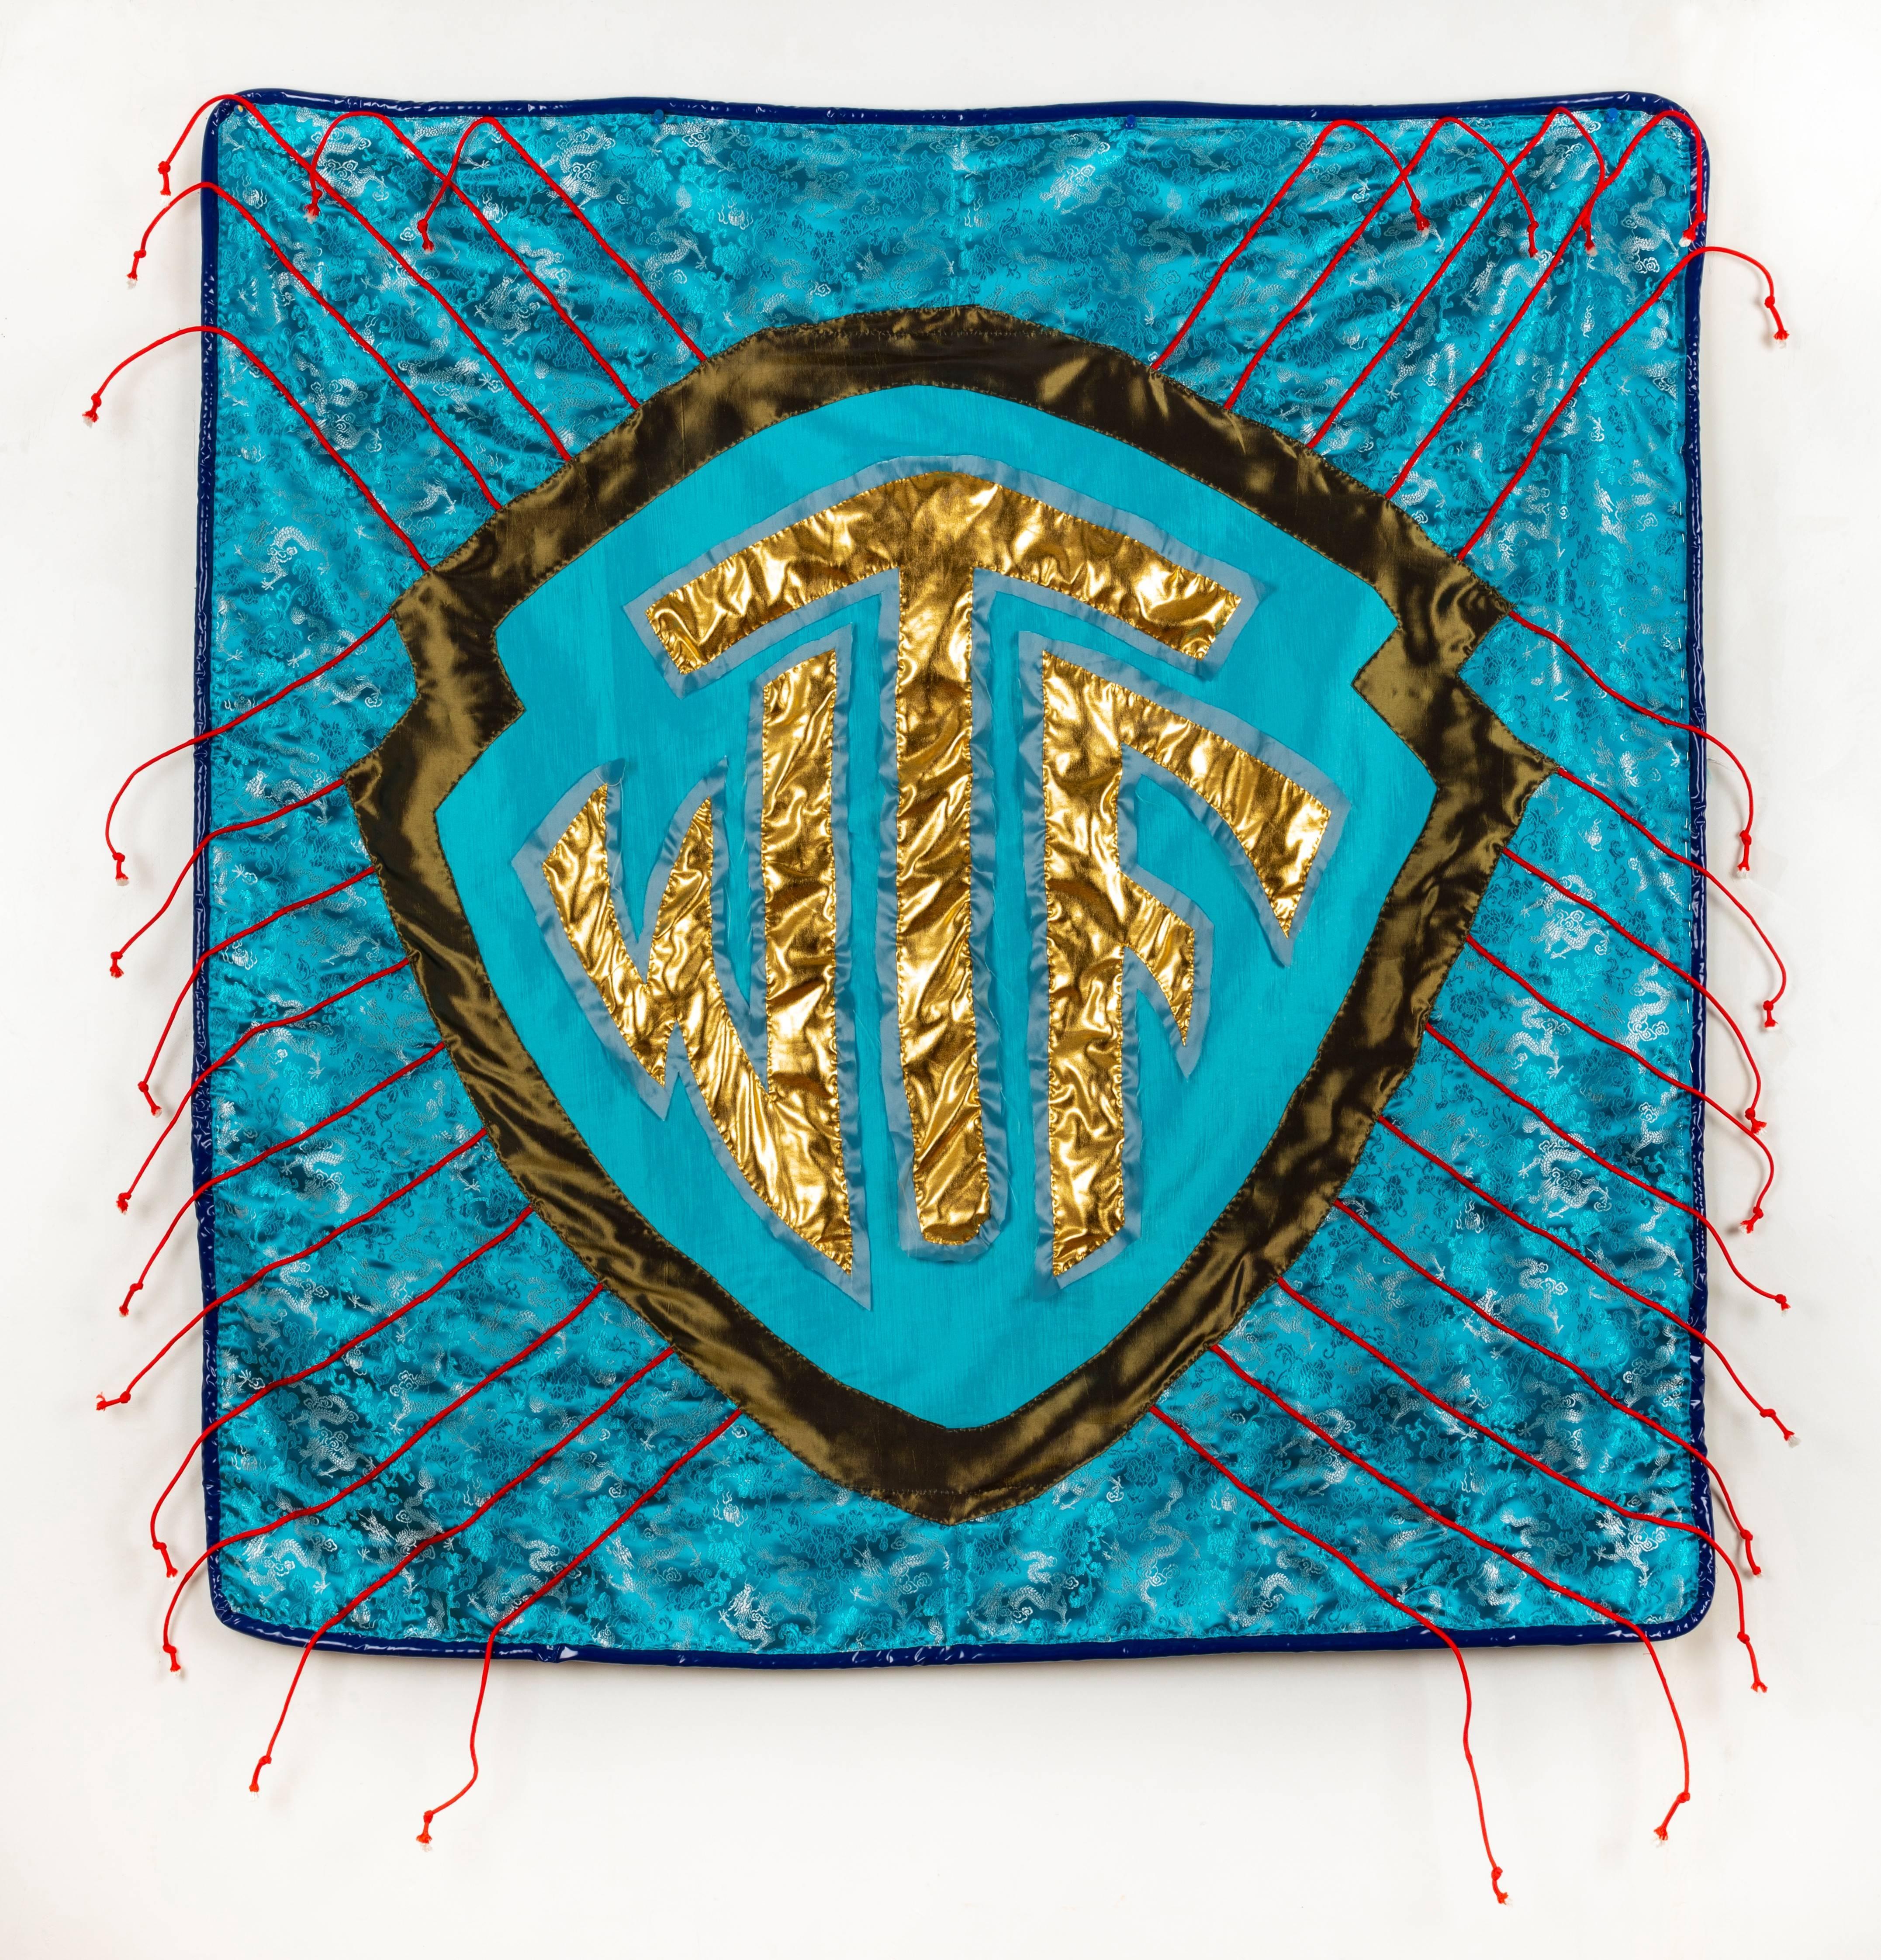 Rita Valley, WTF, 2018, fabric, parachute cord, vinyl, banner